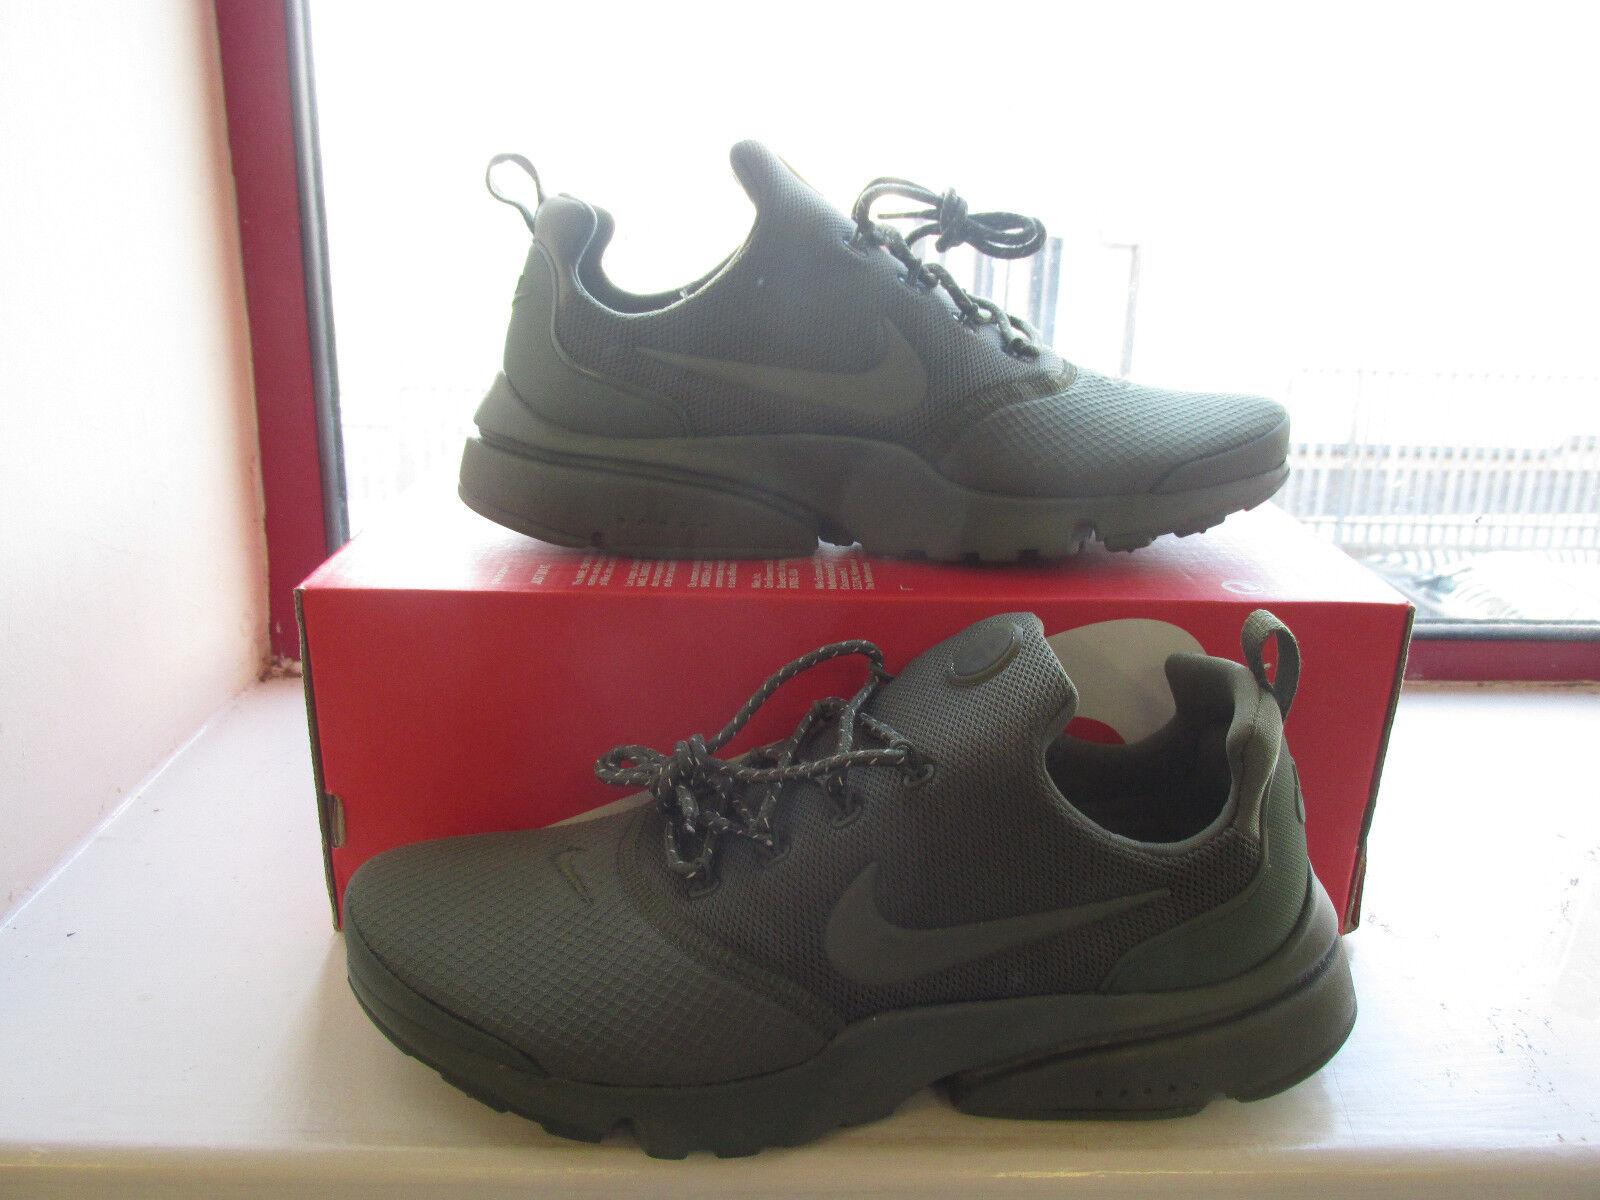 Nike Presto Fly SE Mens Running Trainers 908020 201 Turnschuhe schuhe CLEARANCE